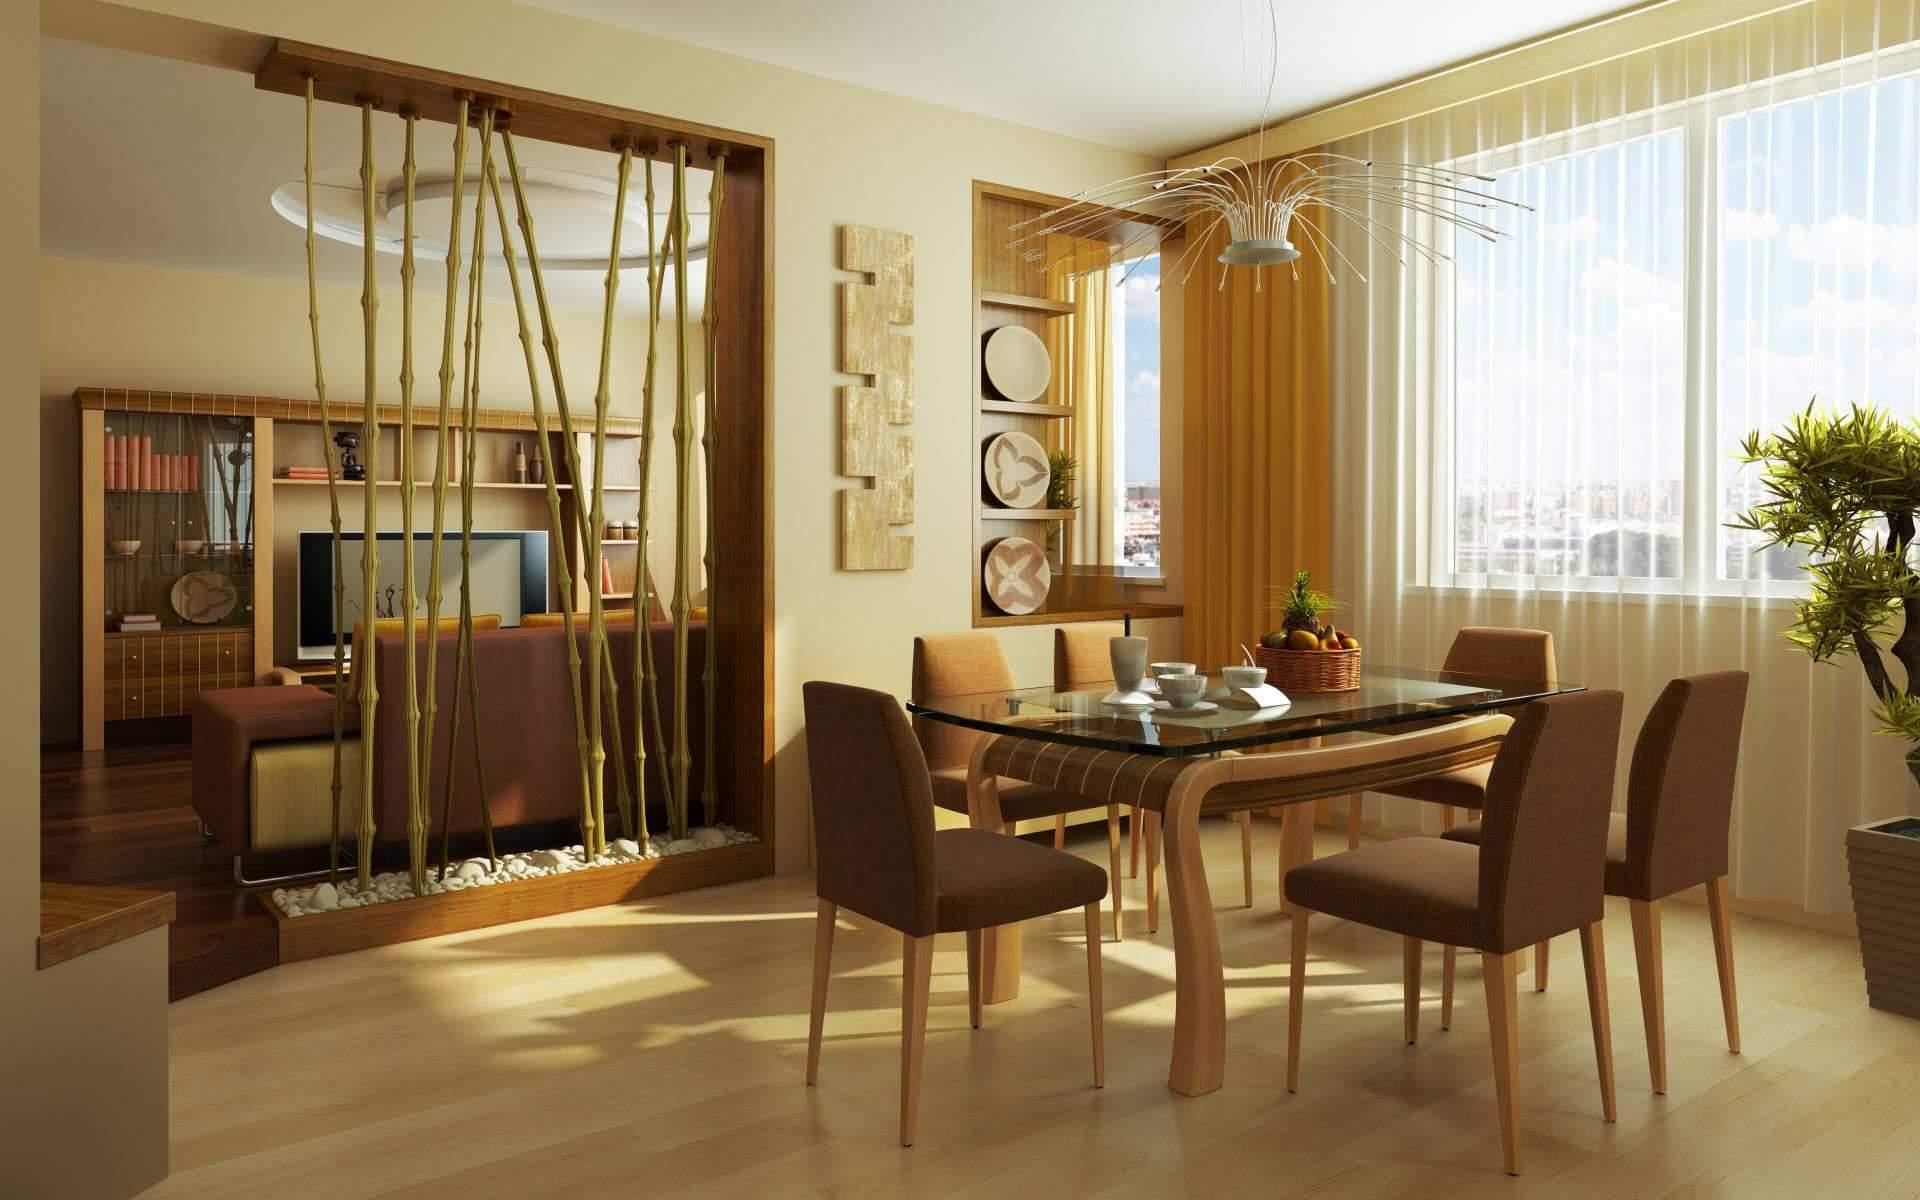 Inspiring Dining Room Interior Design Ideas You Must Try  Ideas 4 Homes